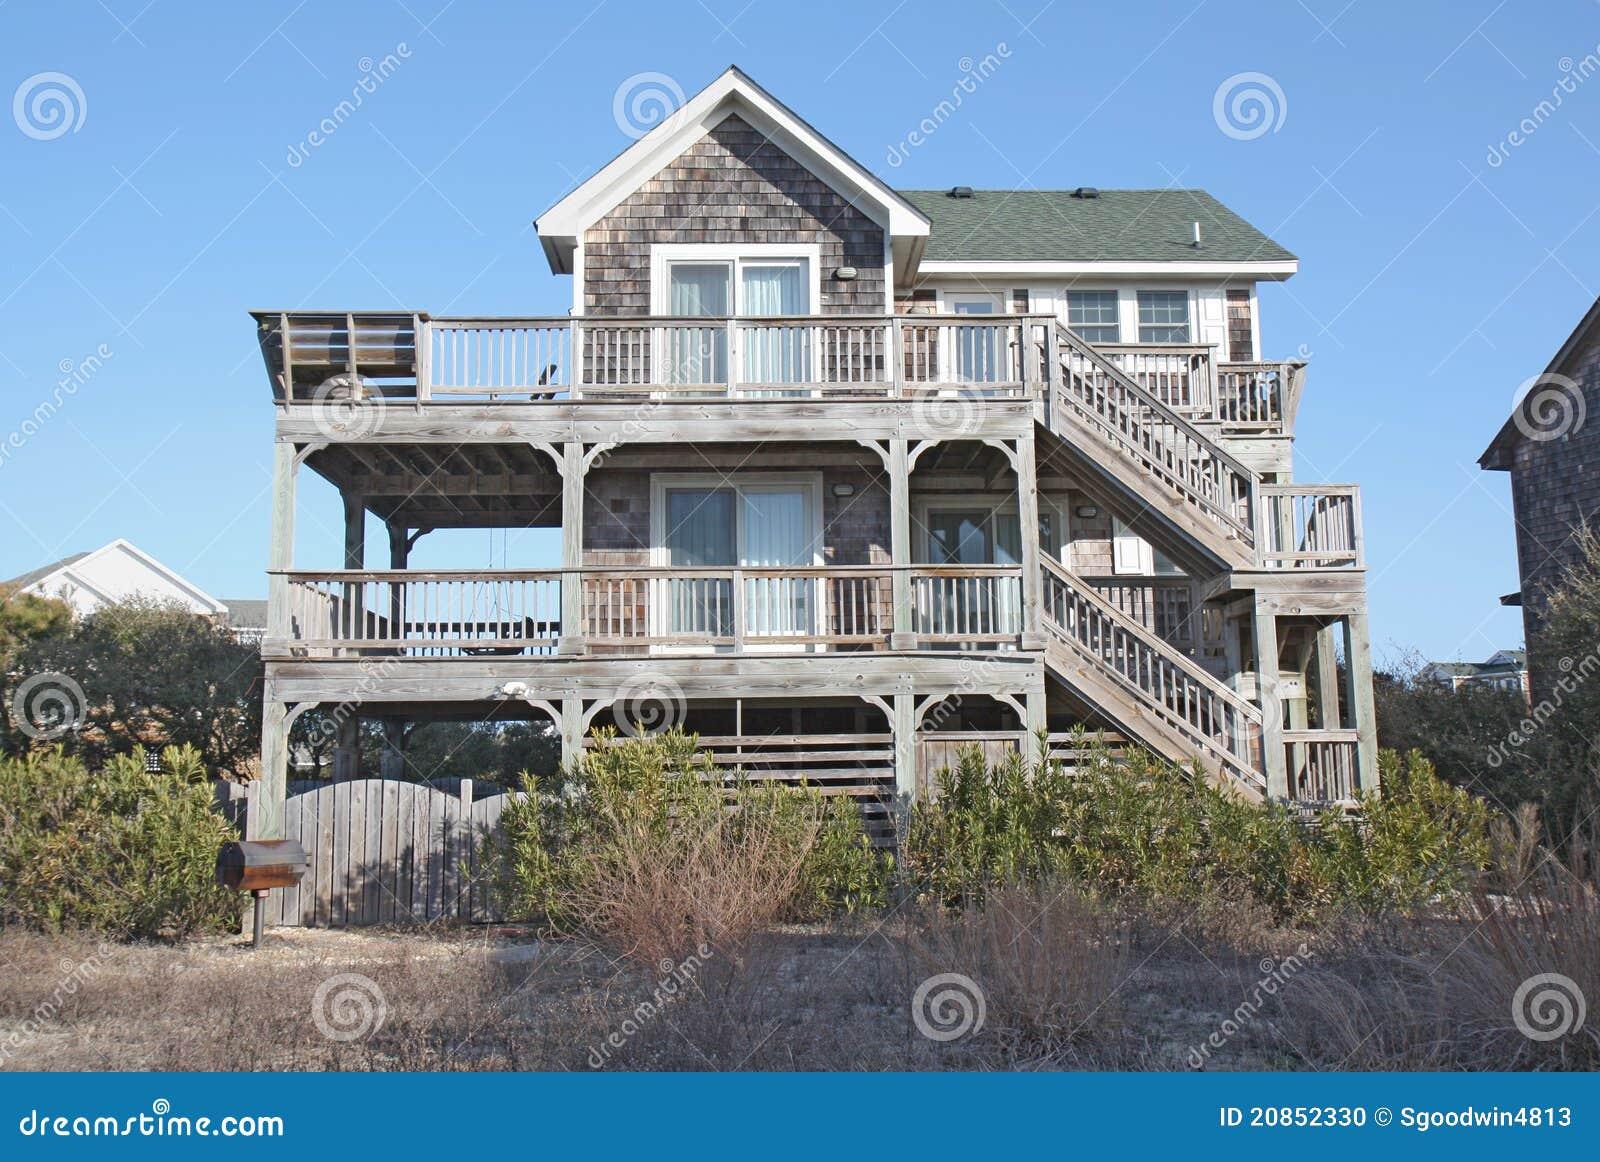 Beach house in north carolina stock photo image 20852330 for The carolina house